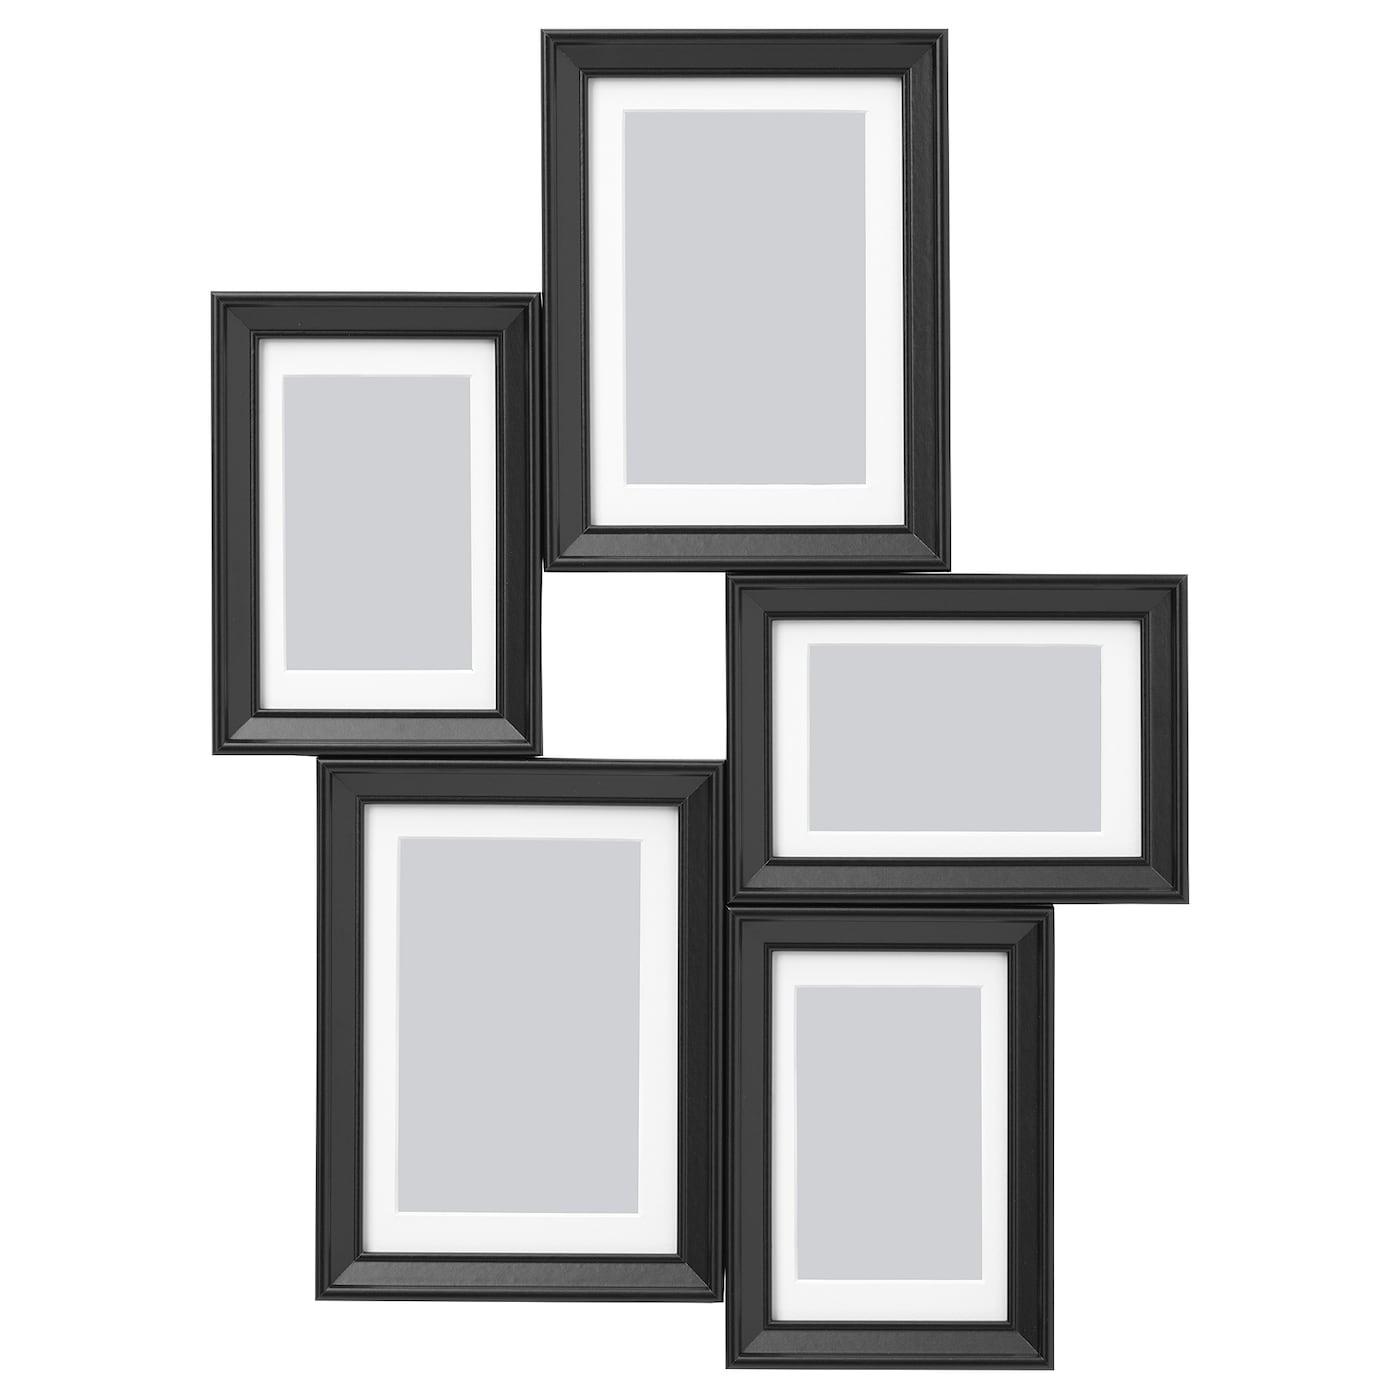 Knopp ng marco 5 fotos negro ikea - Ikea marco fotos ...